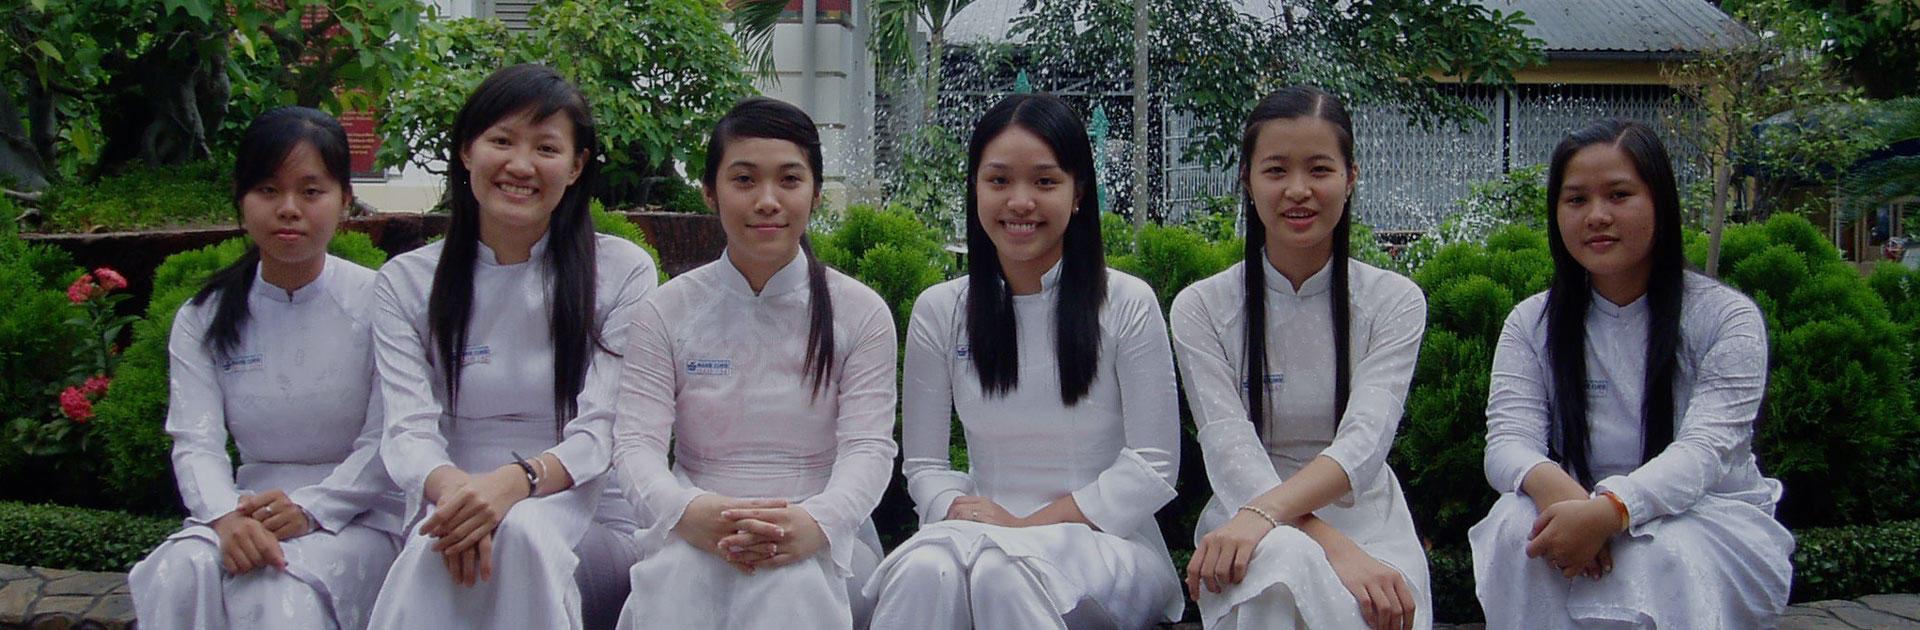 VN Super Vietnam 11 días 5